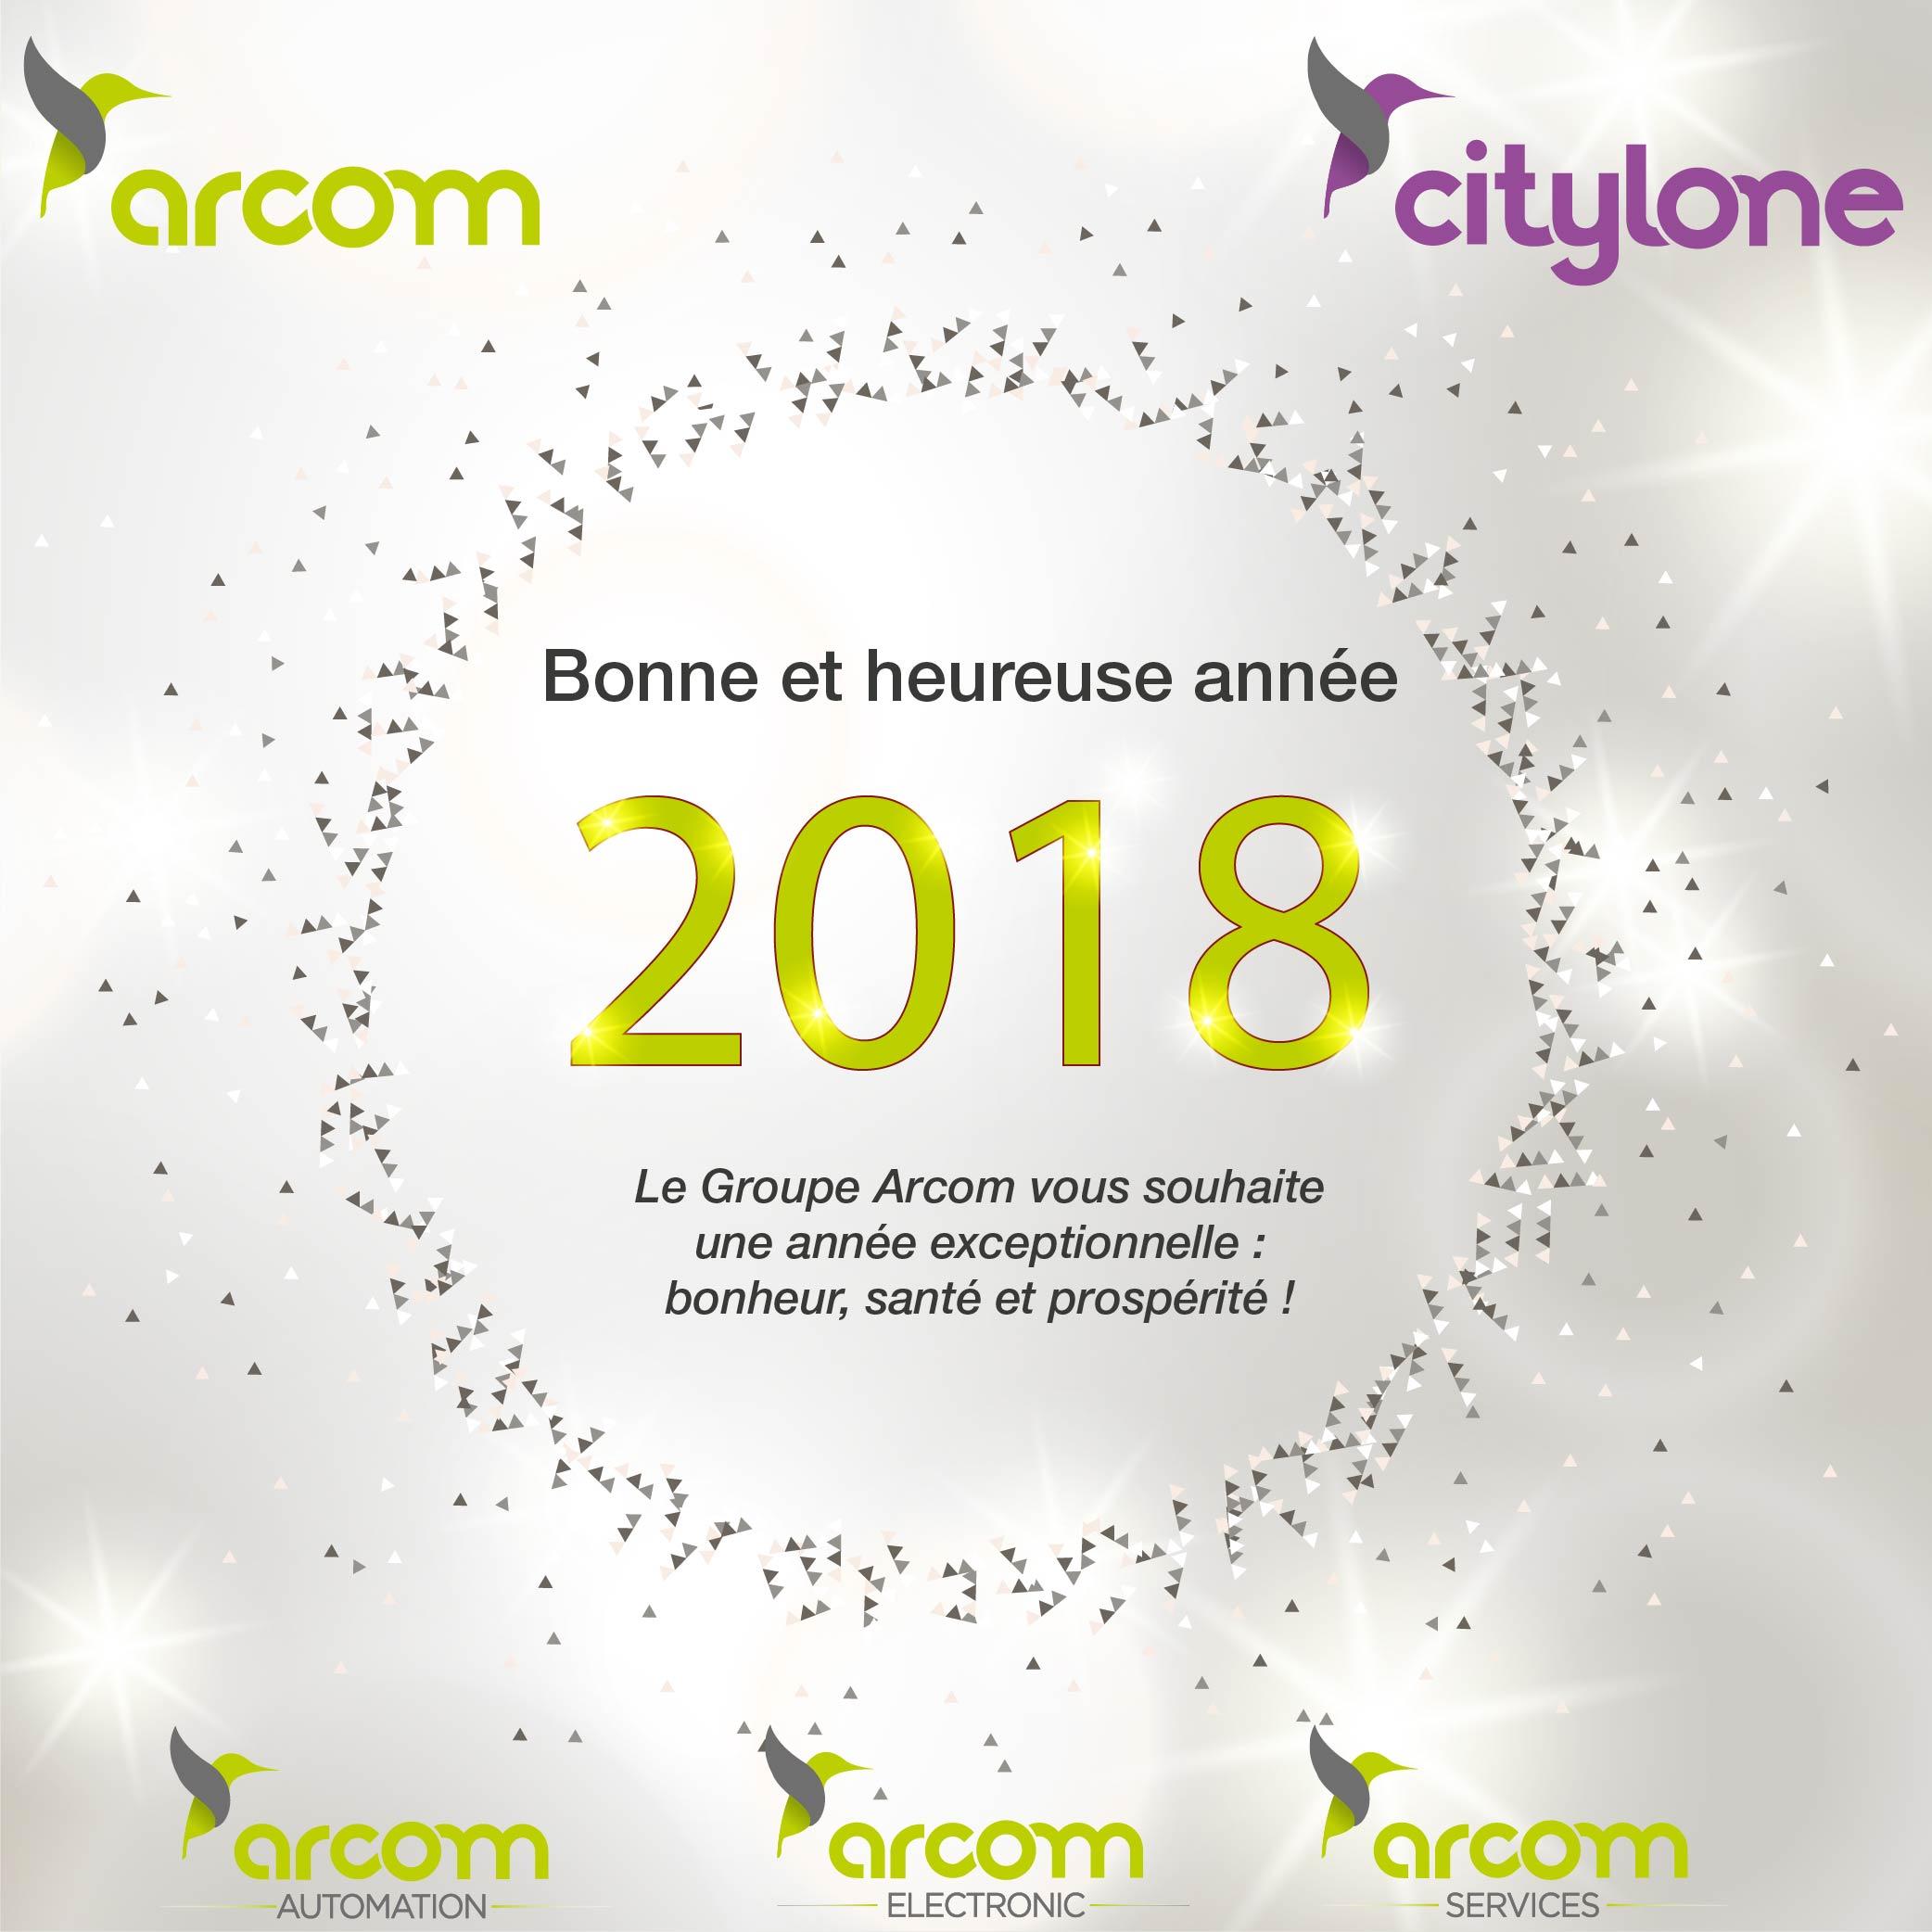 Carte Voeux Arcom Citylone 2018